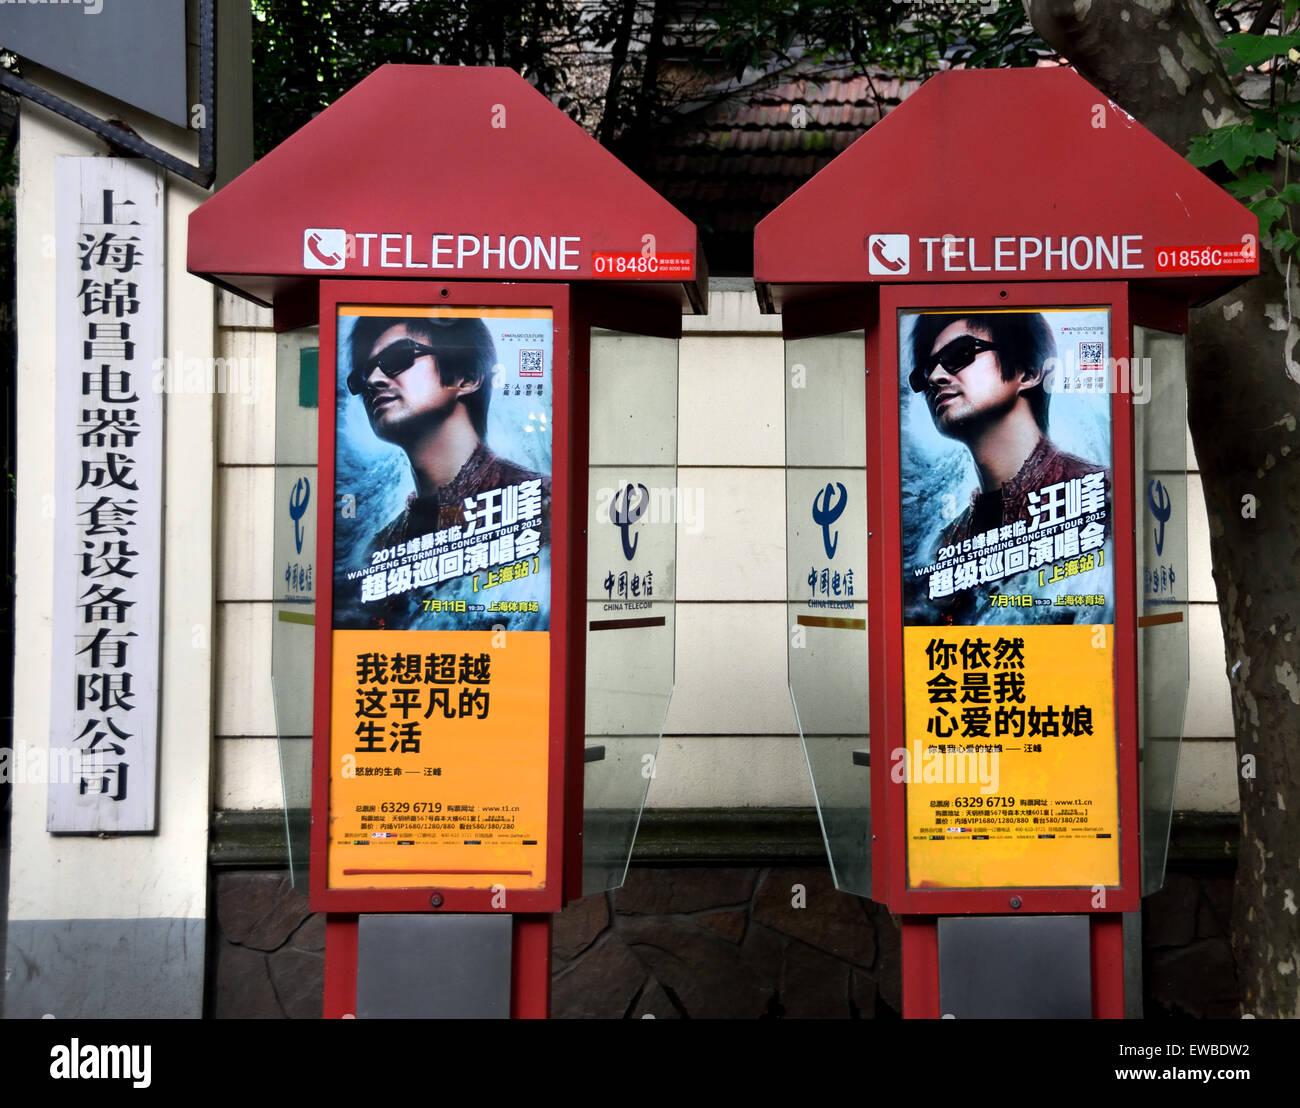 Telephone Phone Shanghai China Chinese ( French Concession  ) - Stock Image